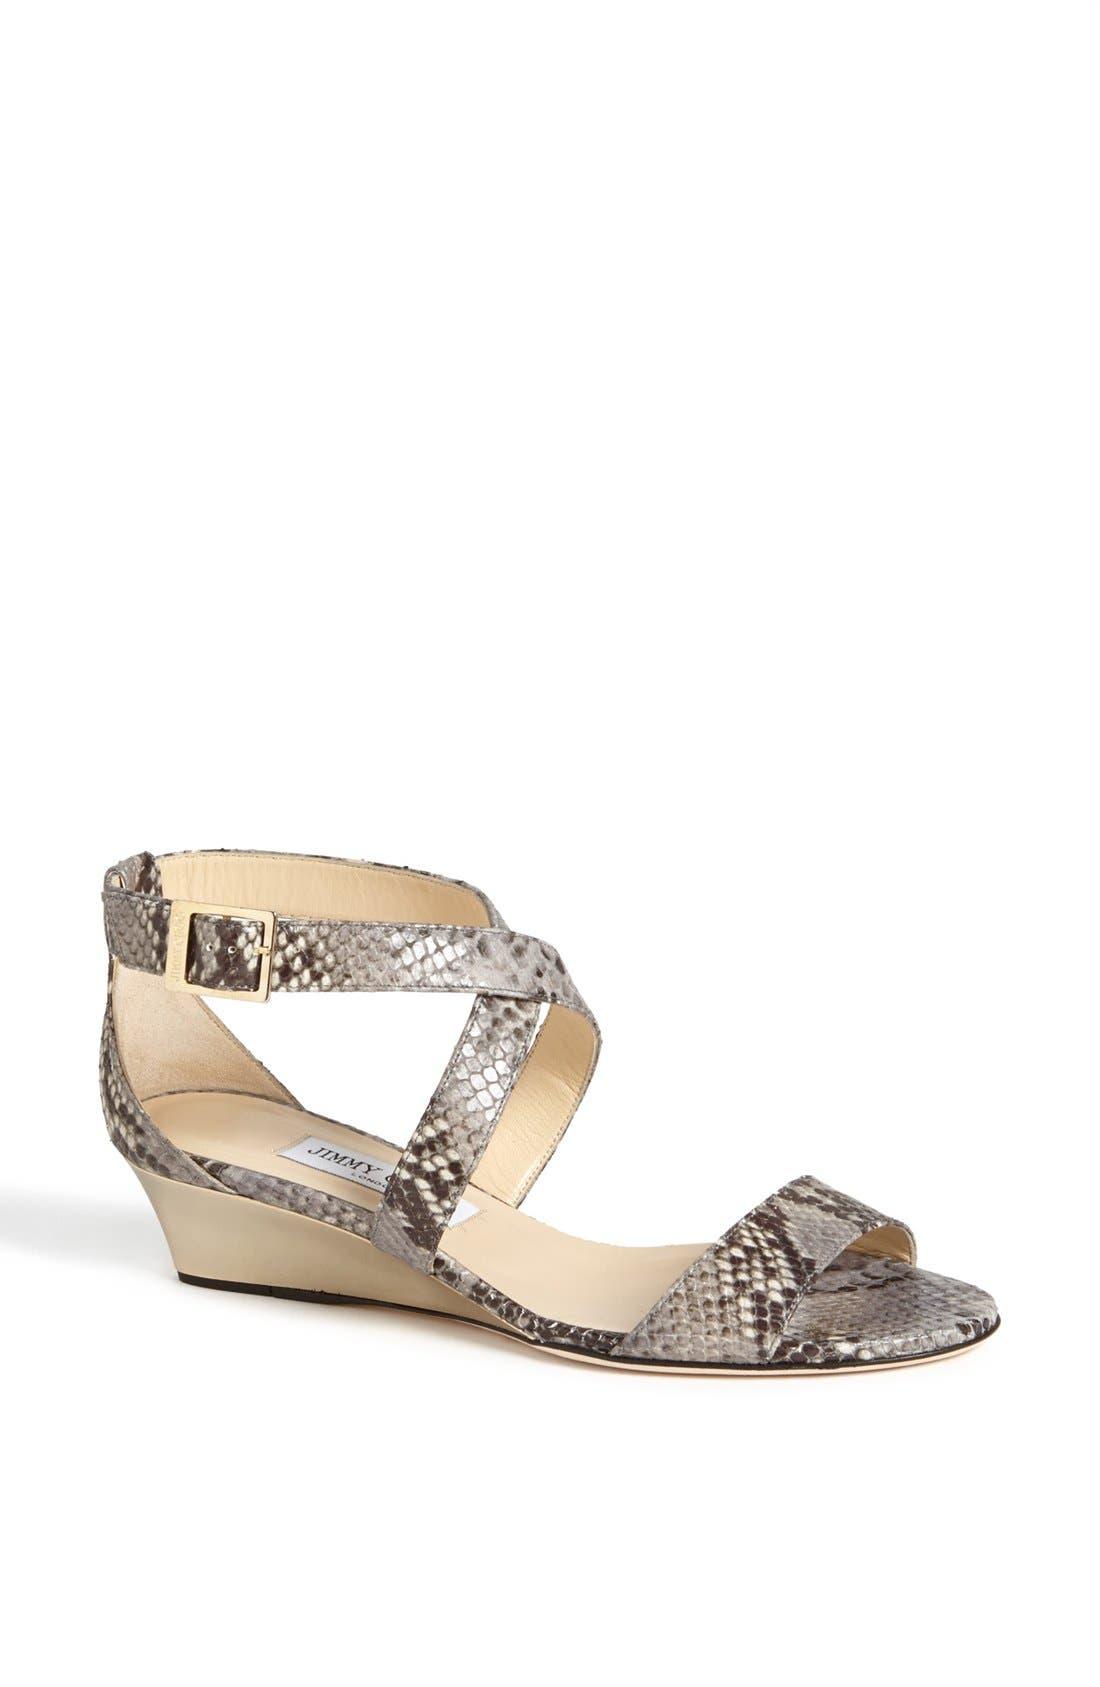 Main Image - Jimmy Choo 'Chiara' Wedge Sandal